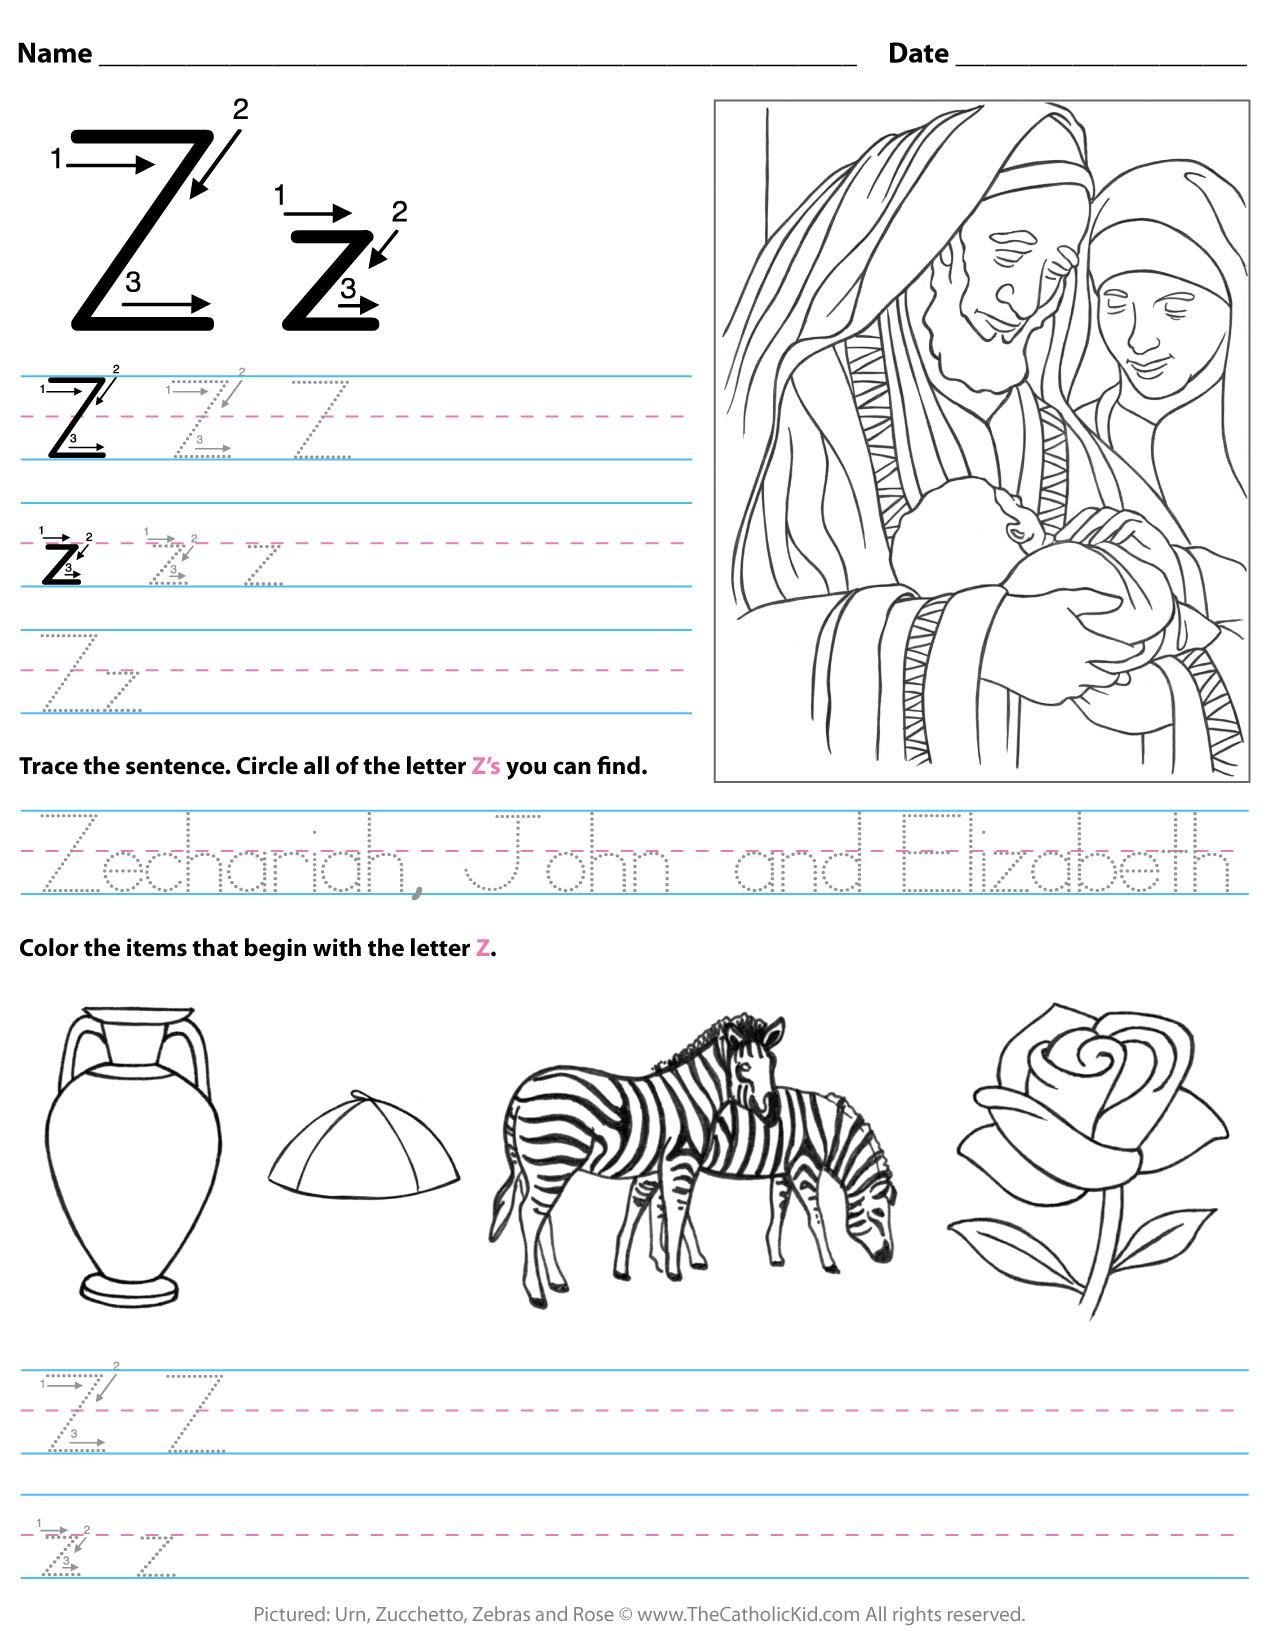 Catholic Alphabet Letter Z Worksheet Preschool Kindergarten with Letter Z Worksheets For Kindergarten